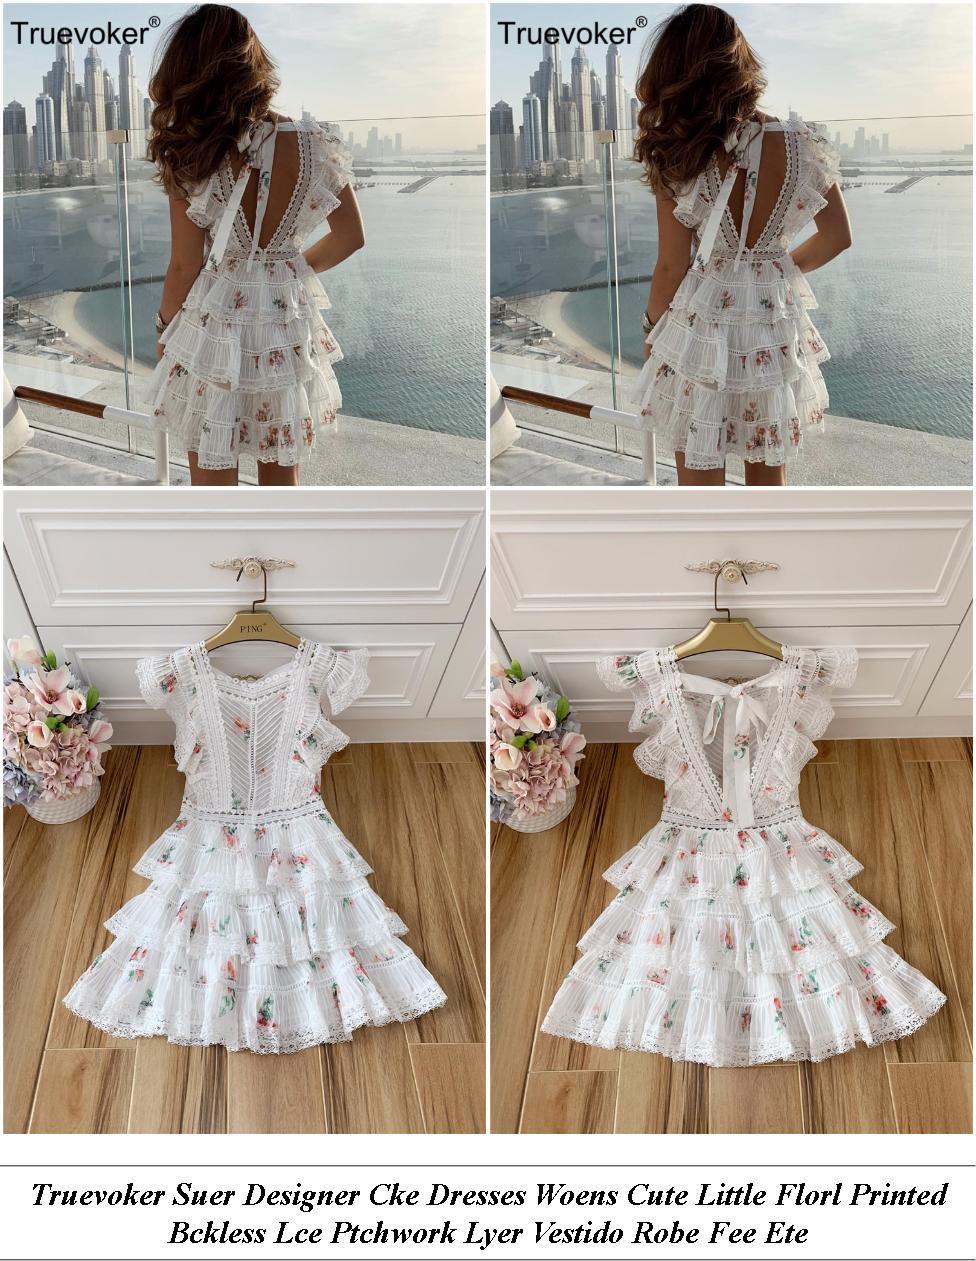 Petite Dresses - Sale On Brands - Velvet Dress - Cheap Clothes Uk